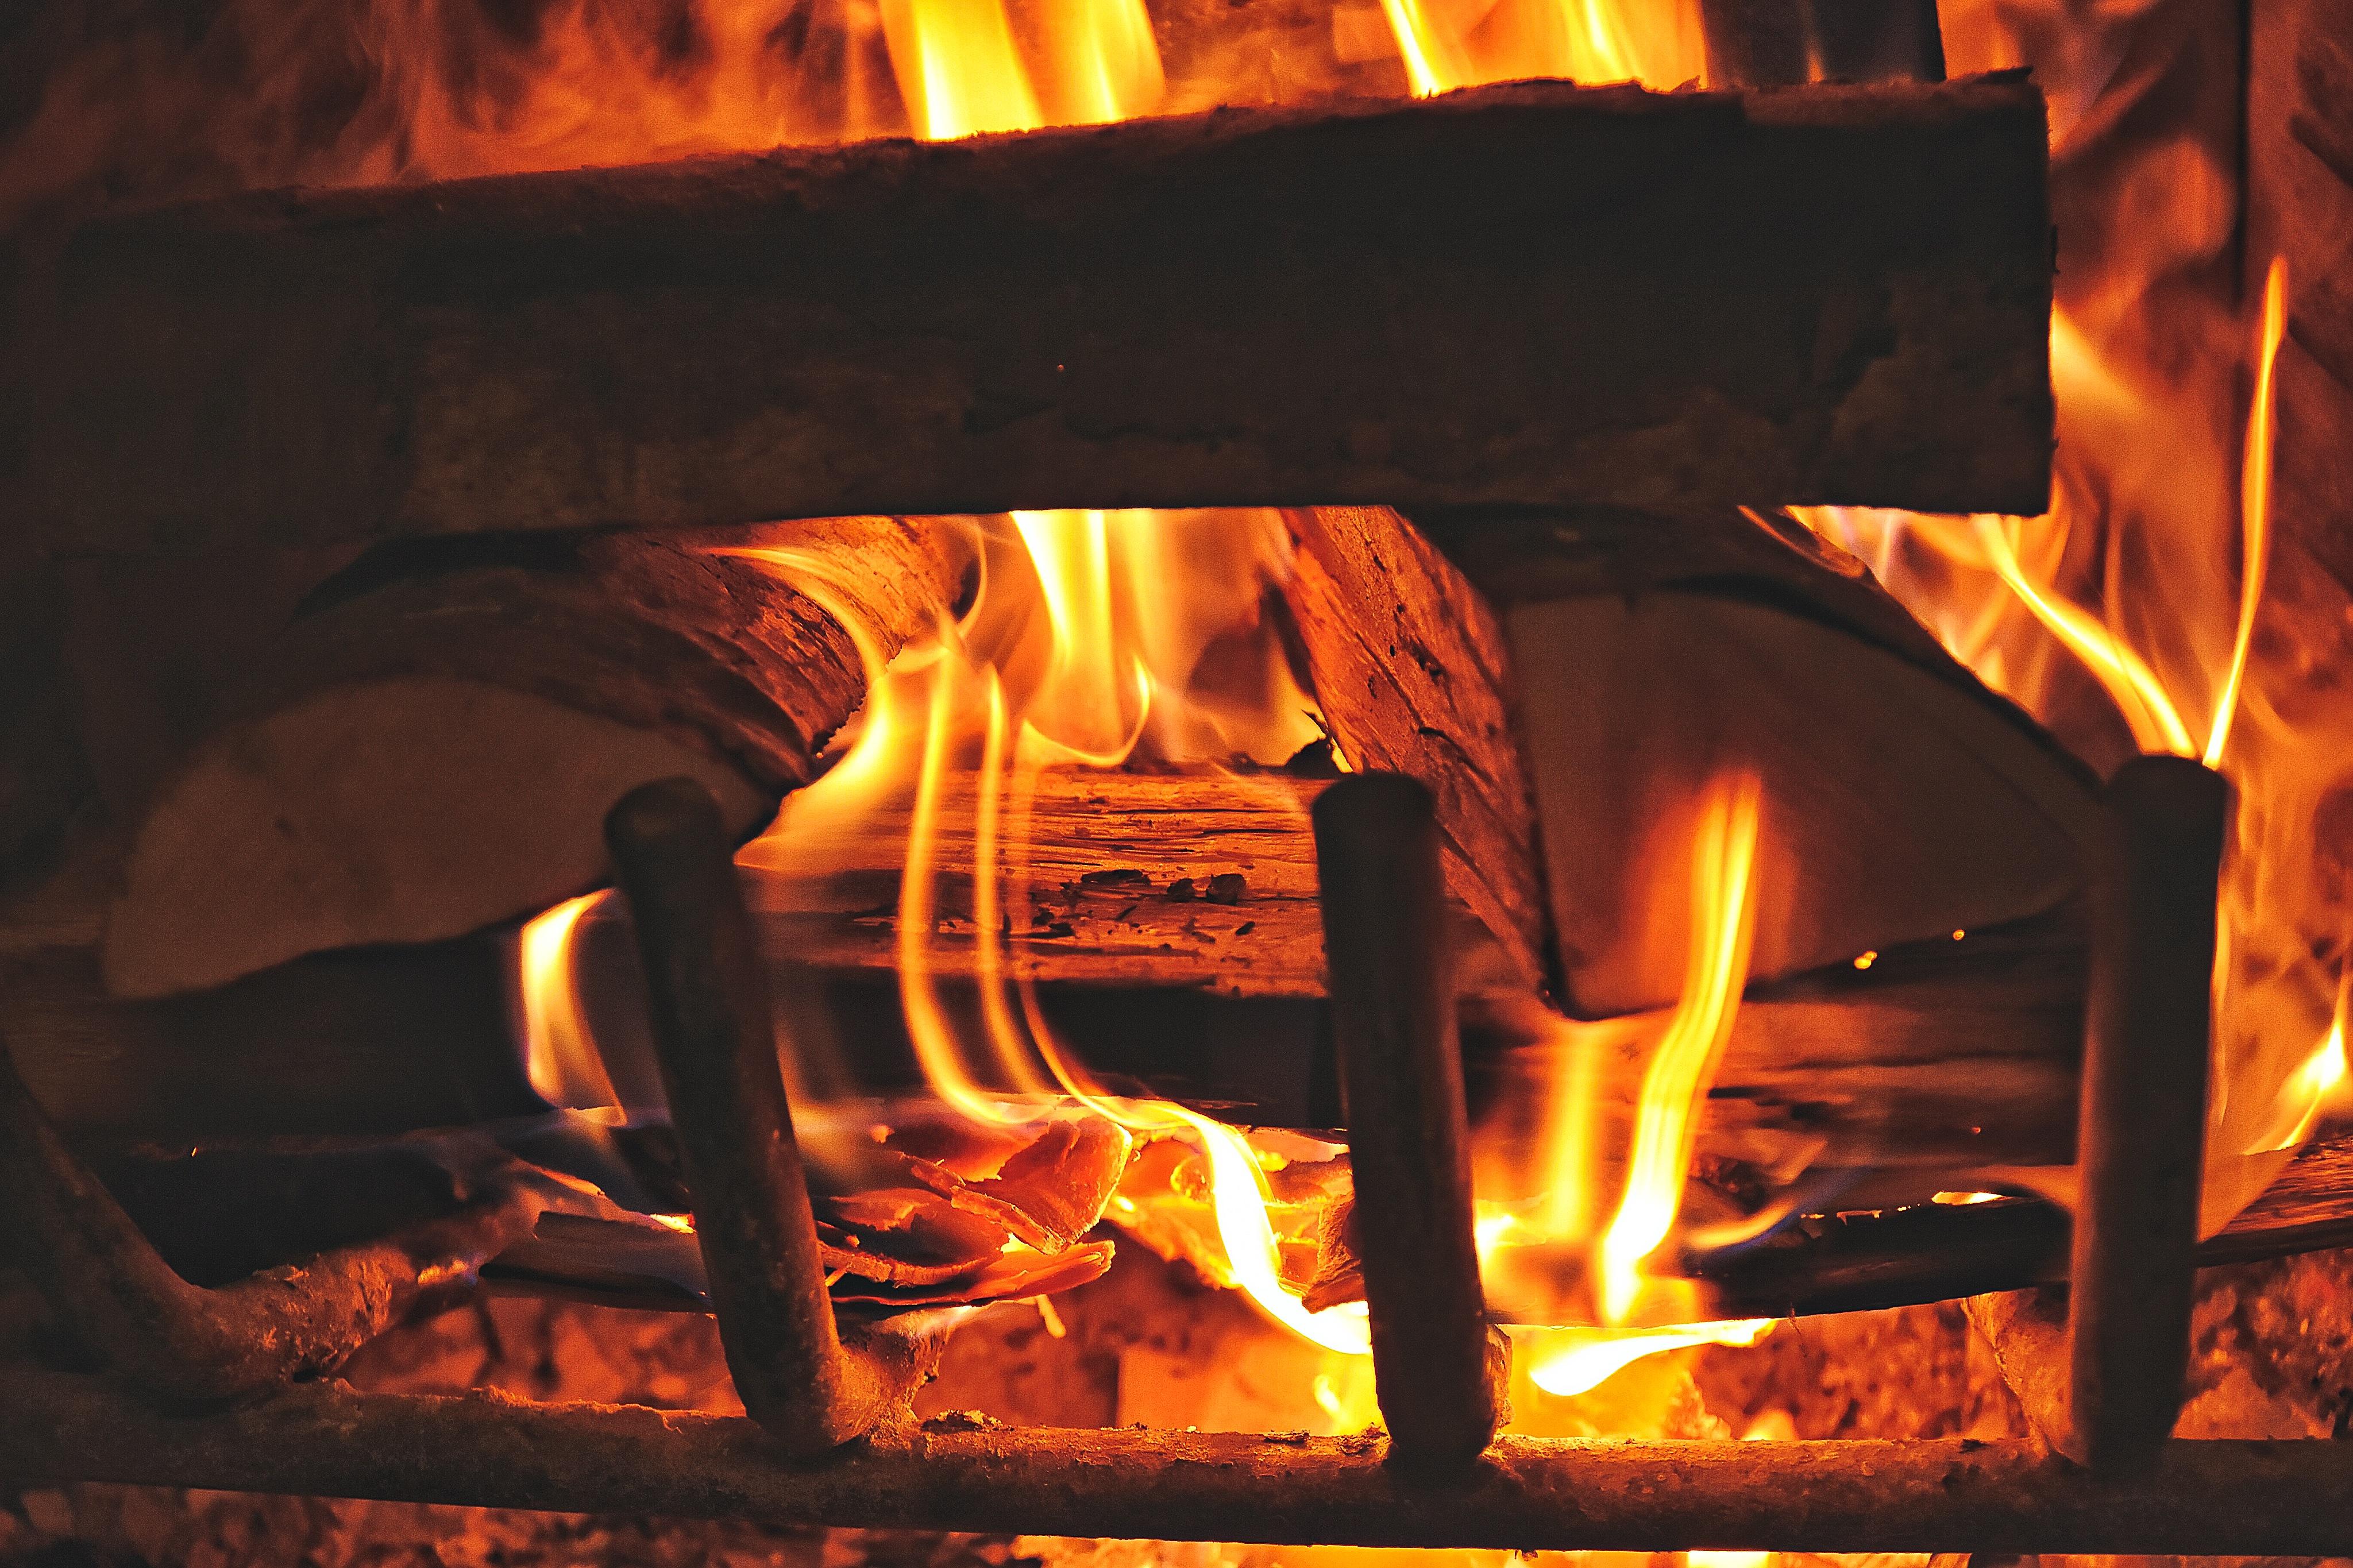 fireplace firewood flicker flame christmas - HD4096×2730